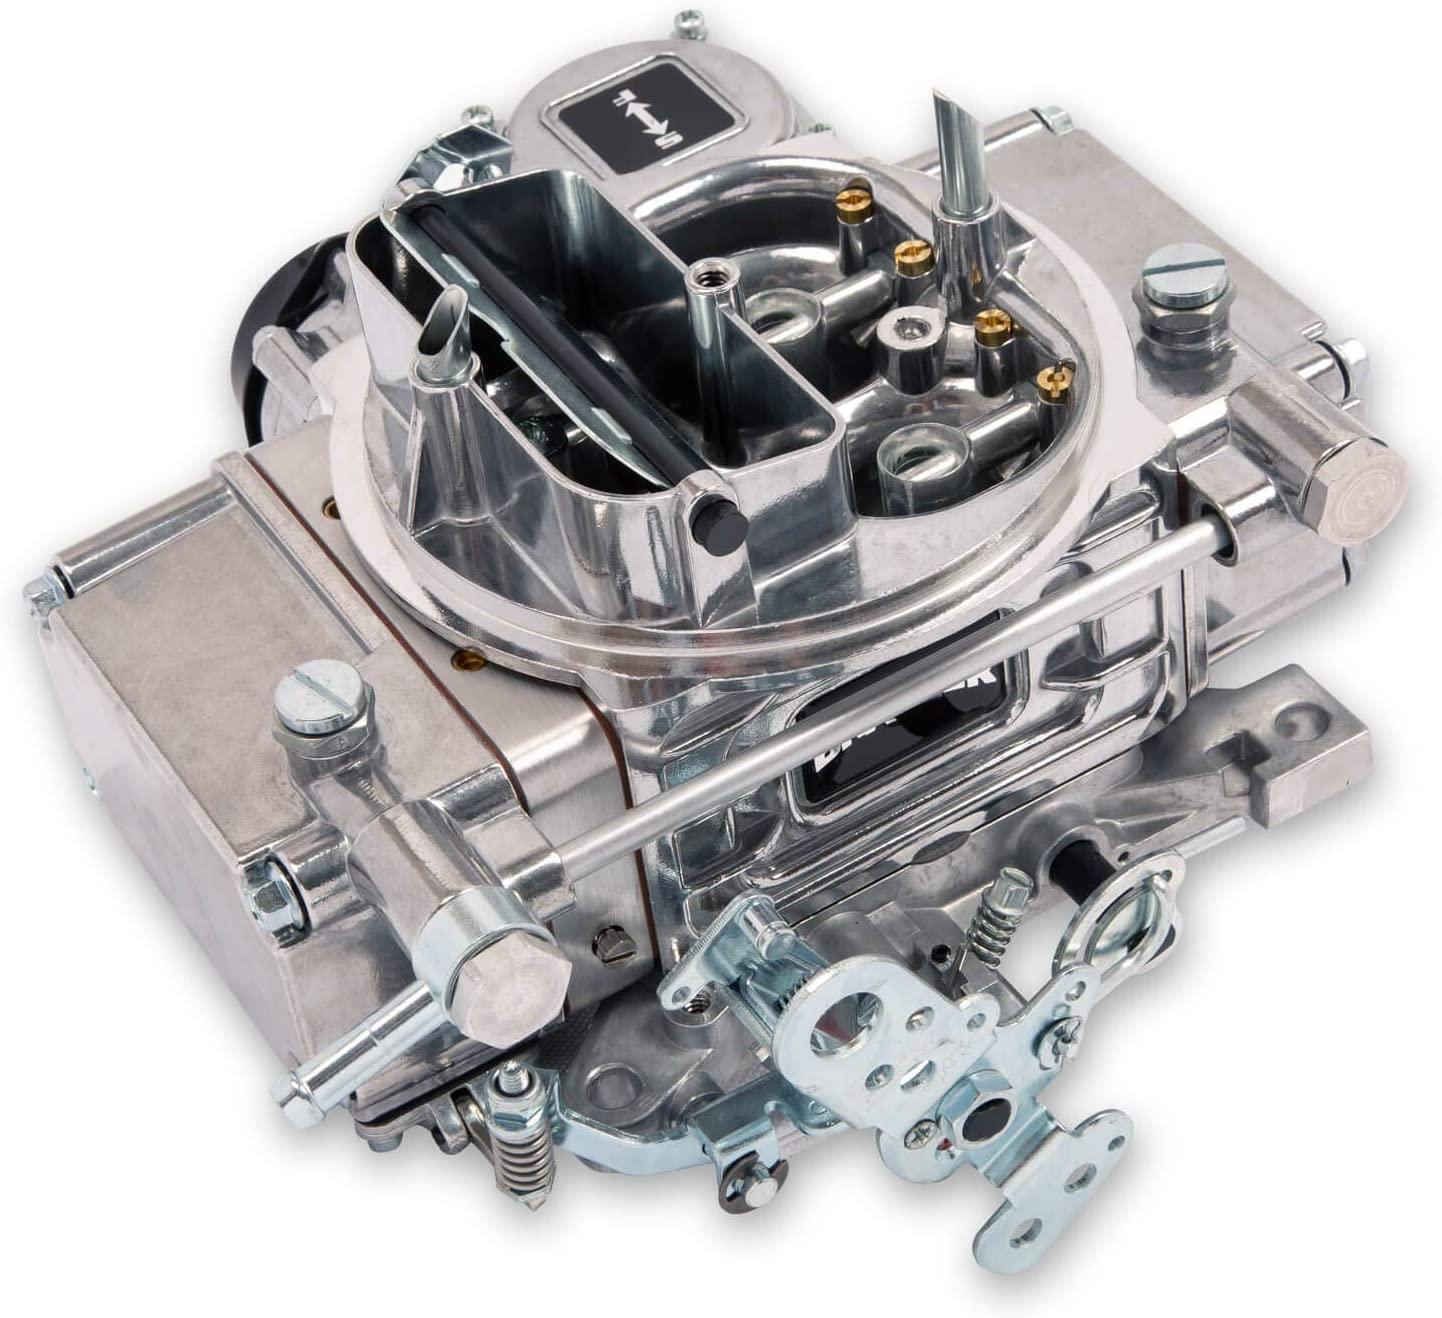 HOLLEY QUICK FUEL BRAWLER CARBURETOR,600 CFM,4150,4 BARREL,ELECTRIC CHOKE,VACUUM SECONDARIES